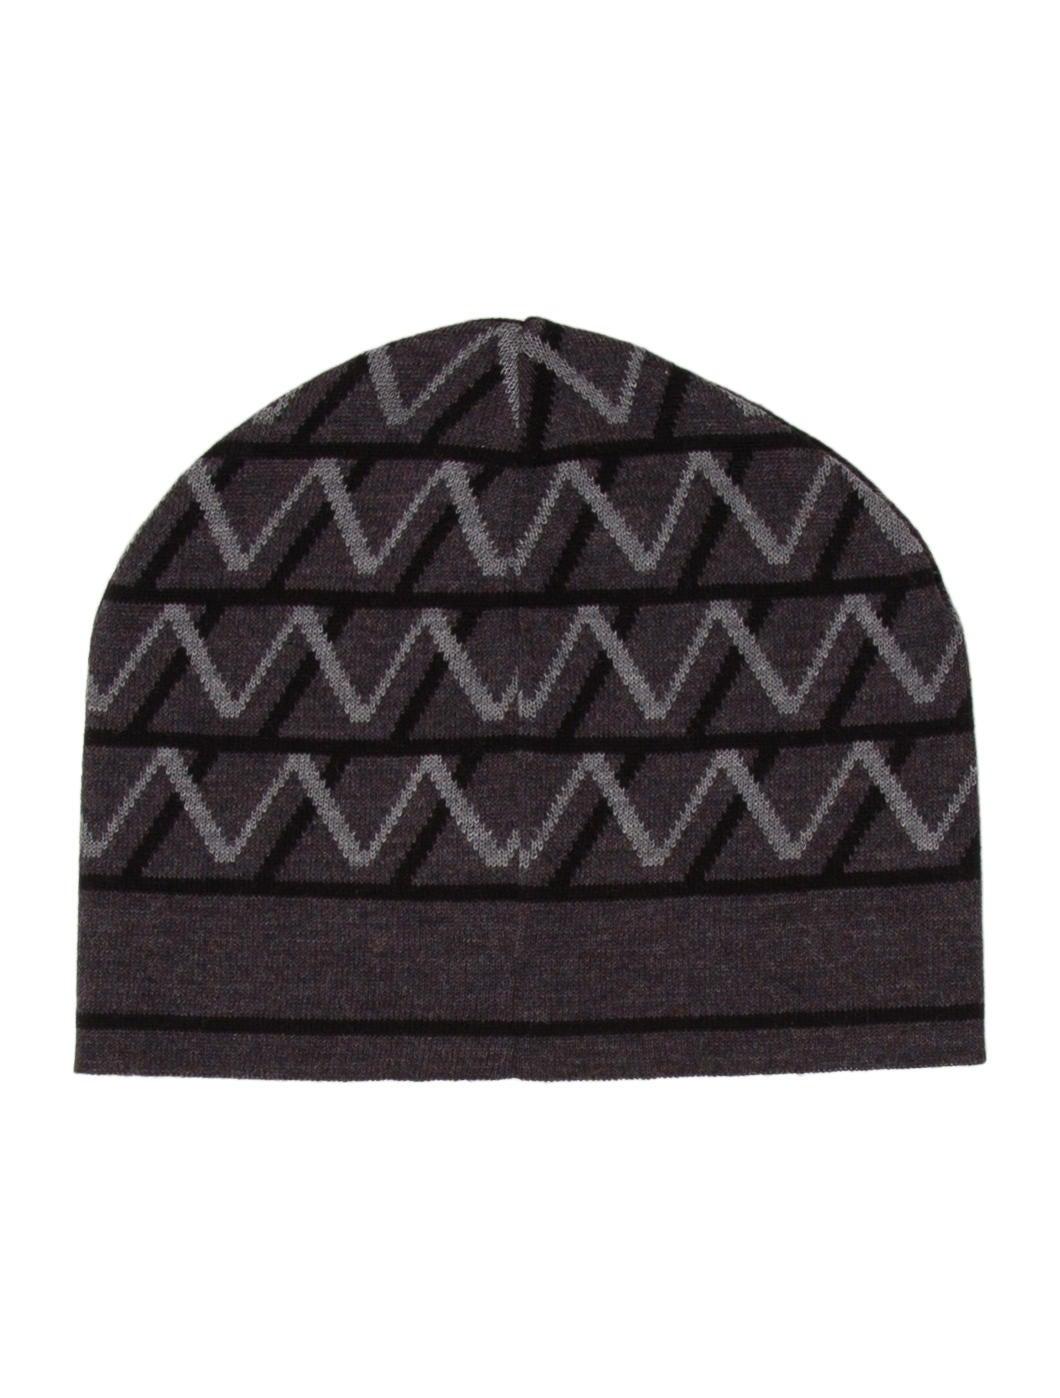 louis vuitton architecture wool hat amp scarf set